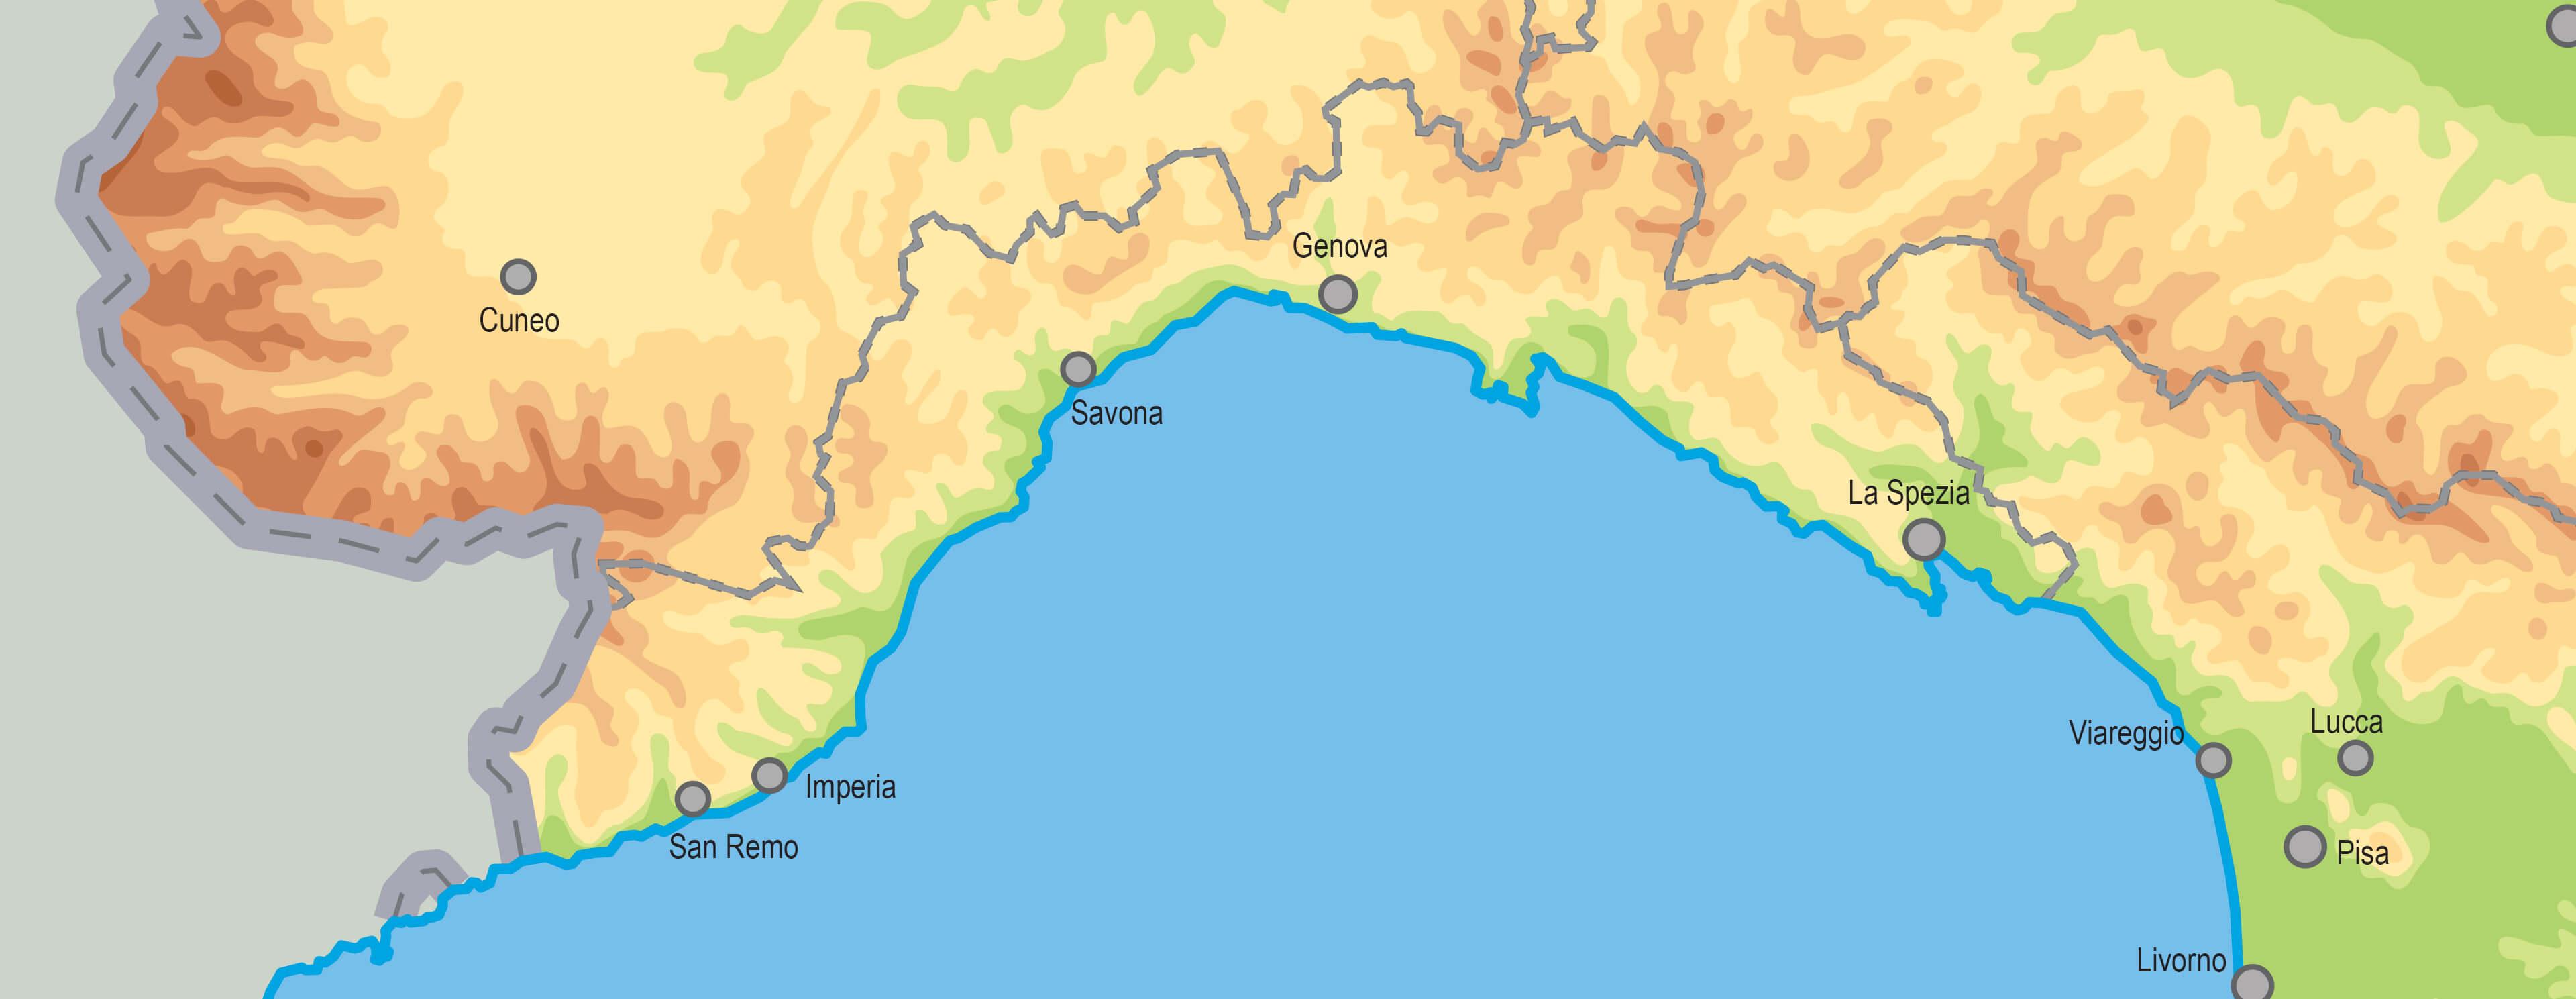 ligurie